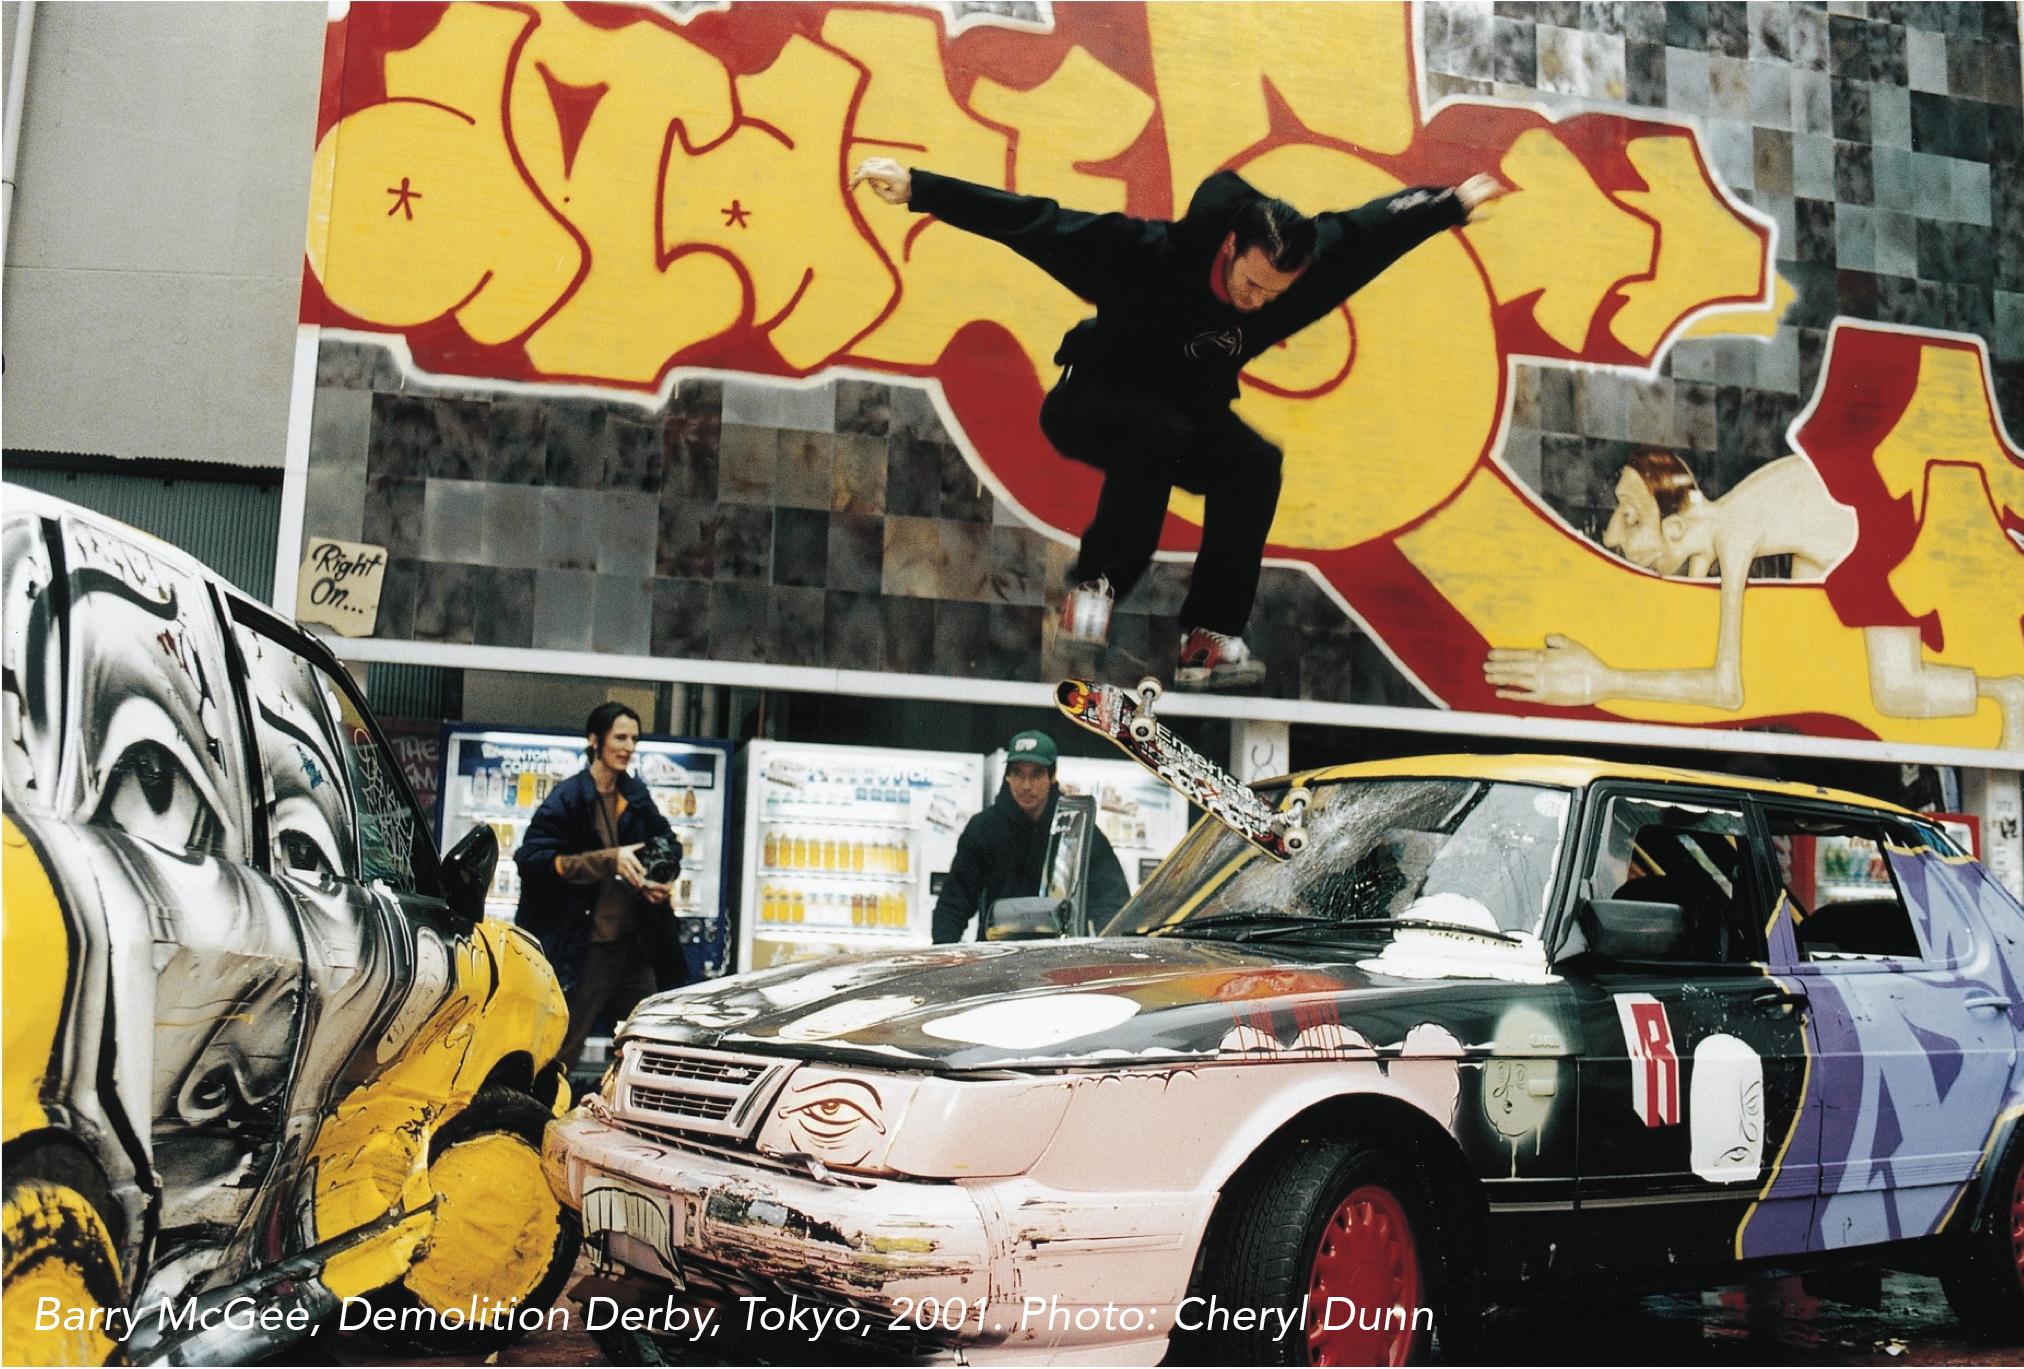 Barry McGee, Demolition Derby, Tokyo, 2001. Photo: Cheryl Dunn